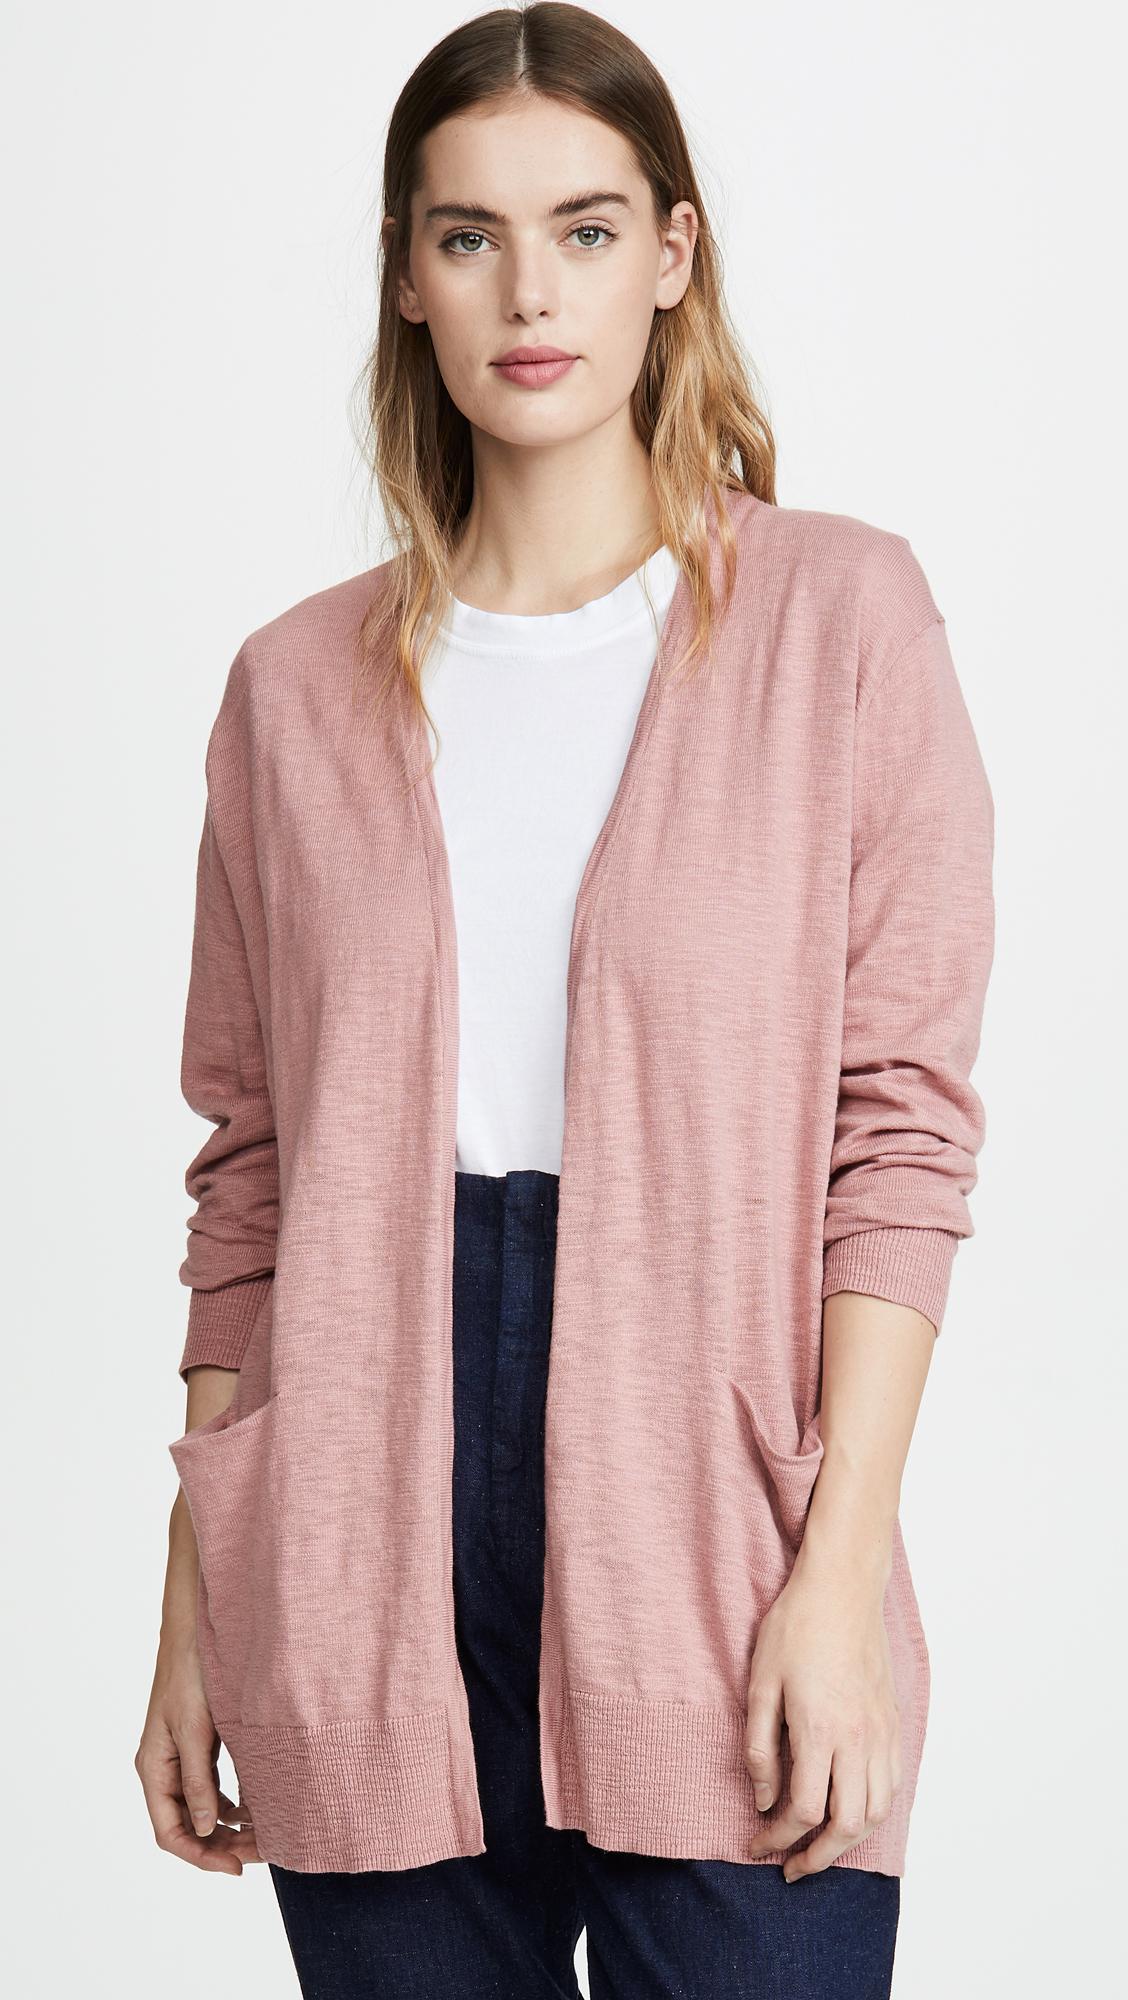 577549f8ed Madewell Summer Ryder Cardigan Sweater